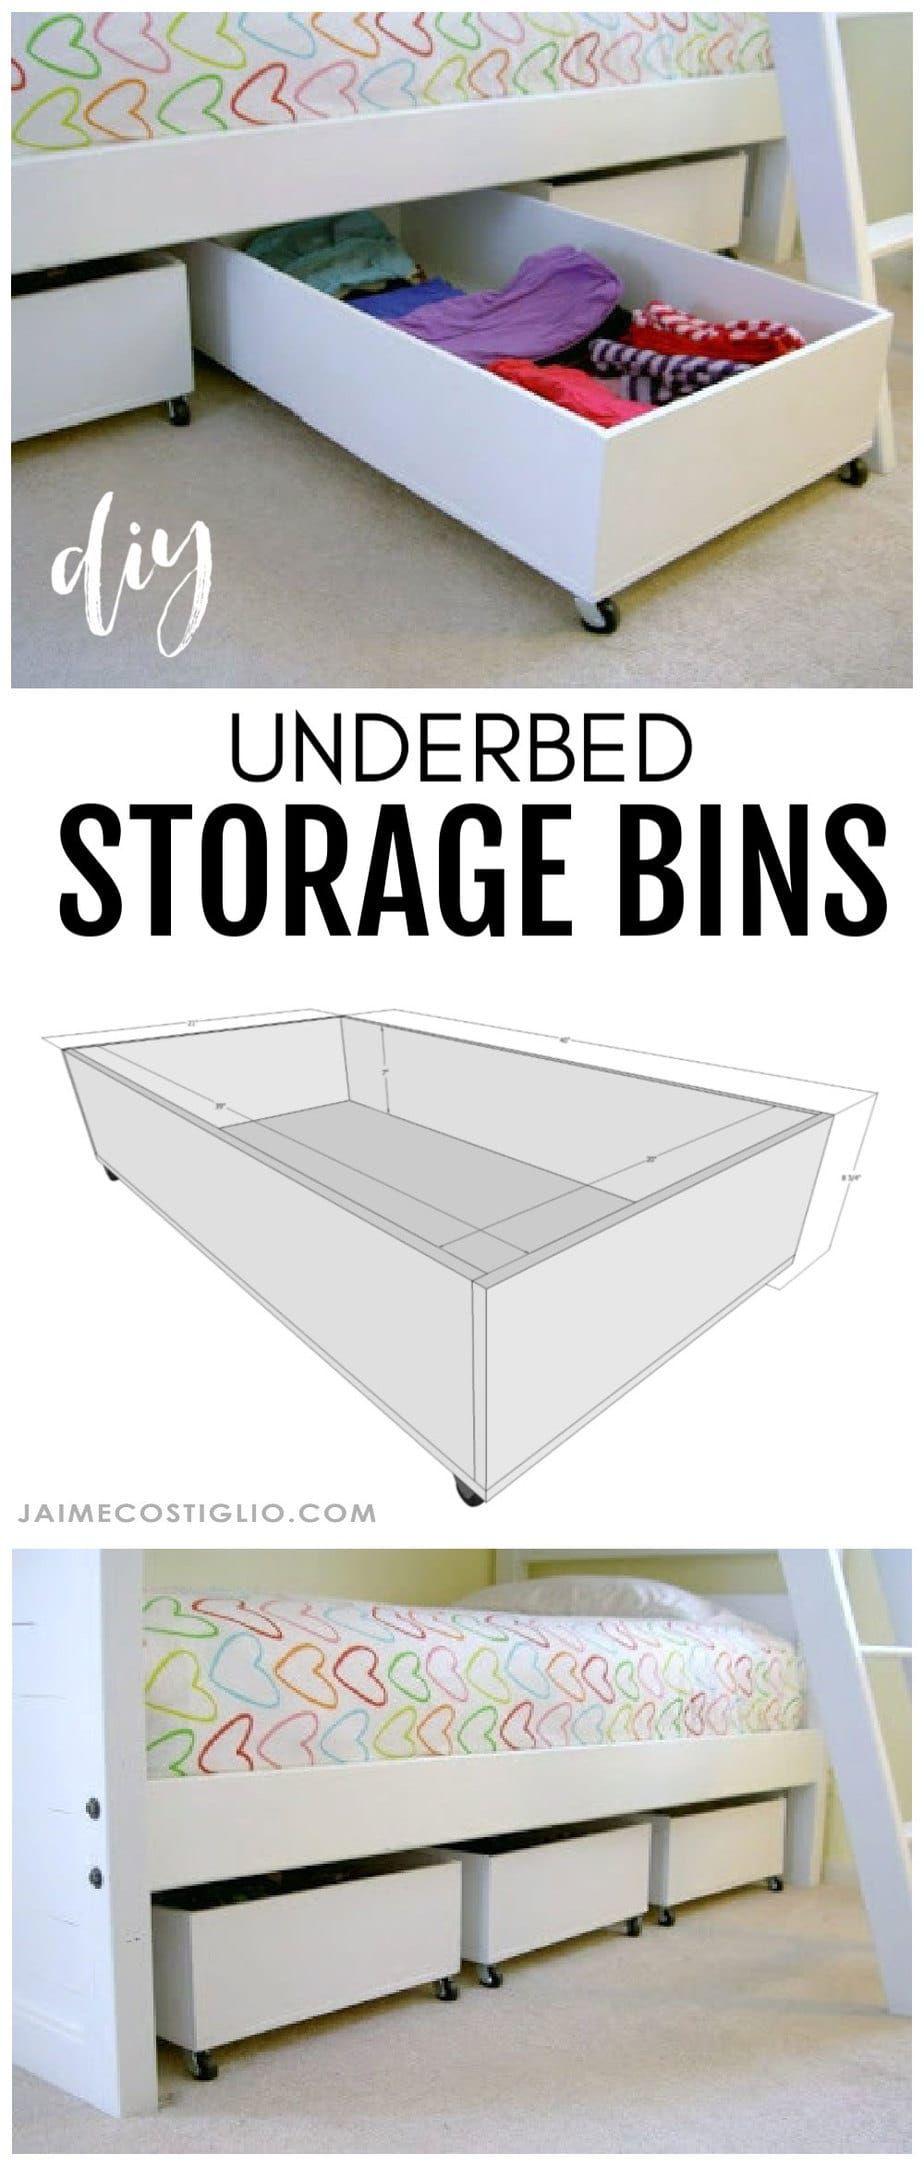 Diy Underbed Storage Bins From Plywood Jaime Costiglio In 2020 Diy Storage Bed Under Bed Storage Bins Under Bed Storage